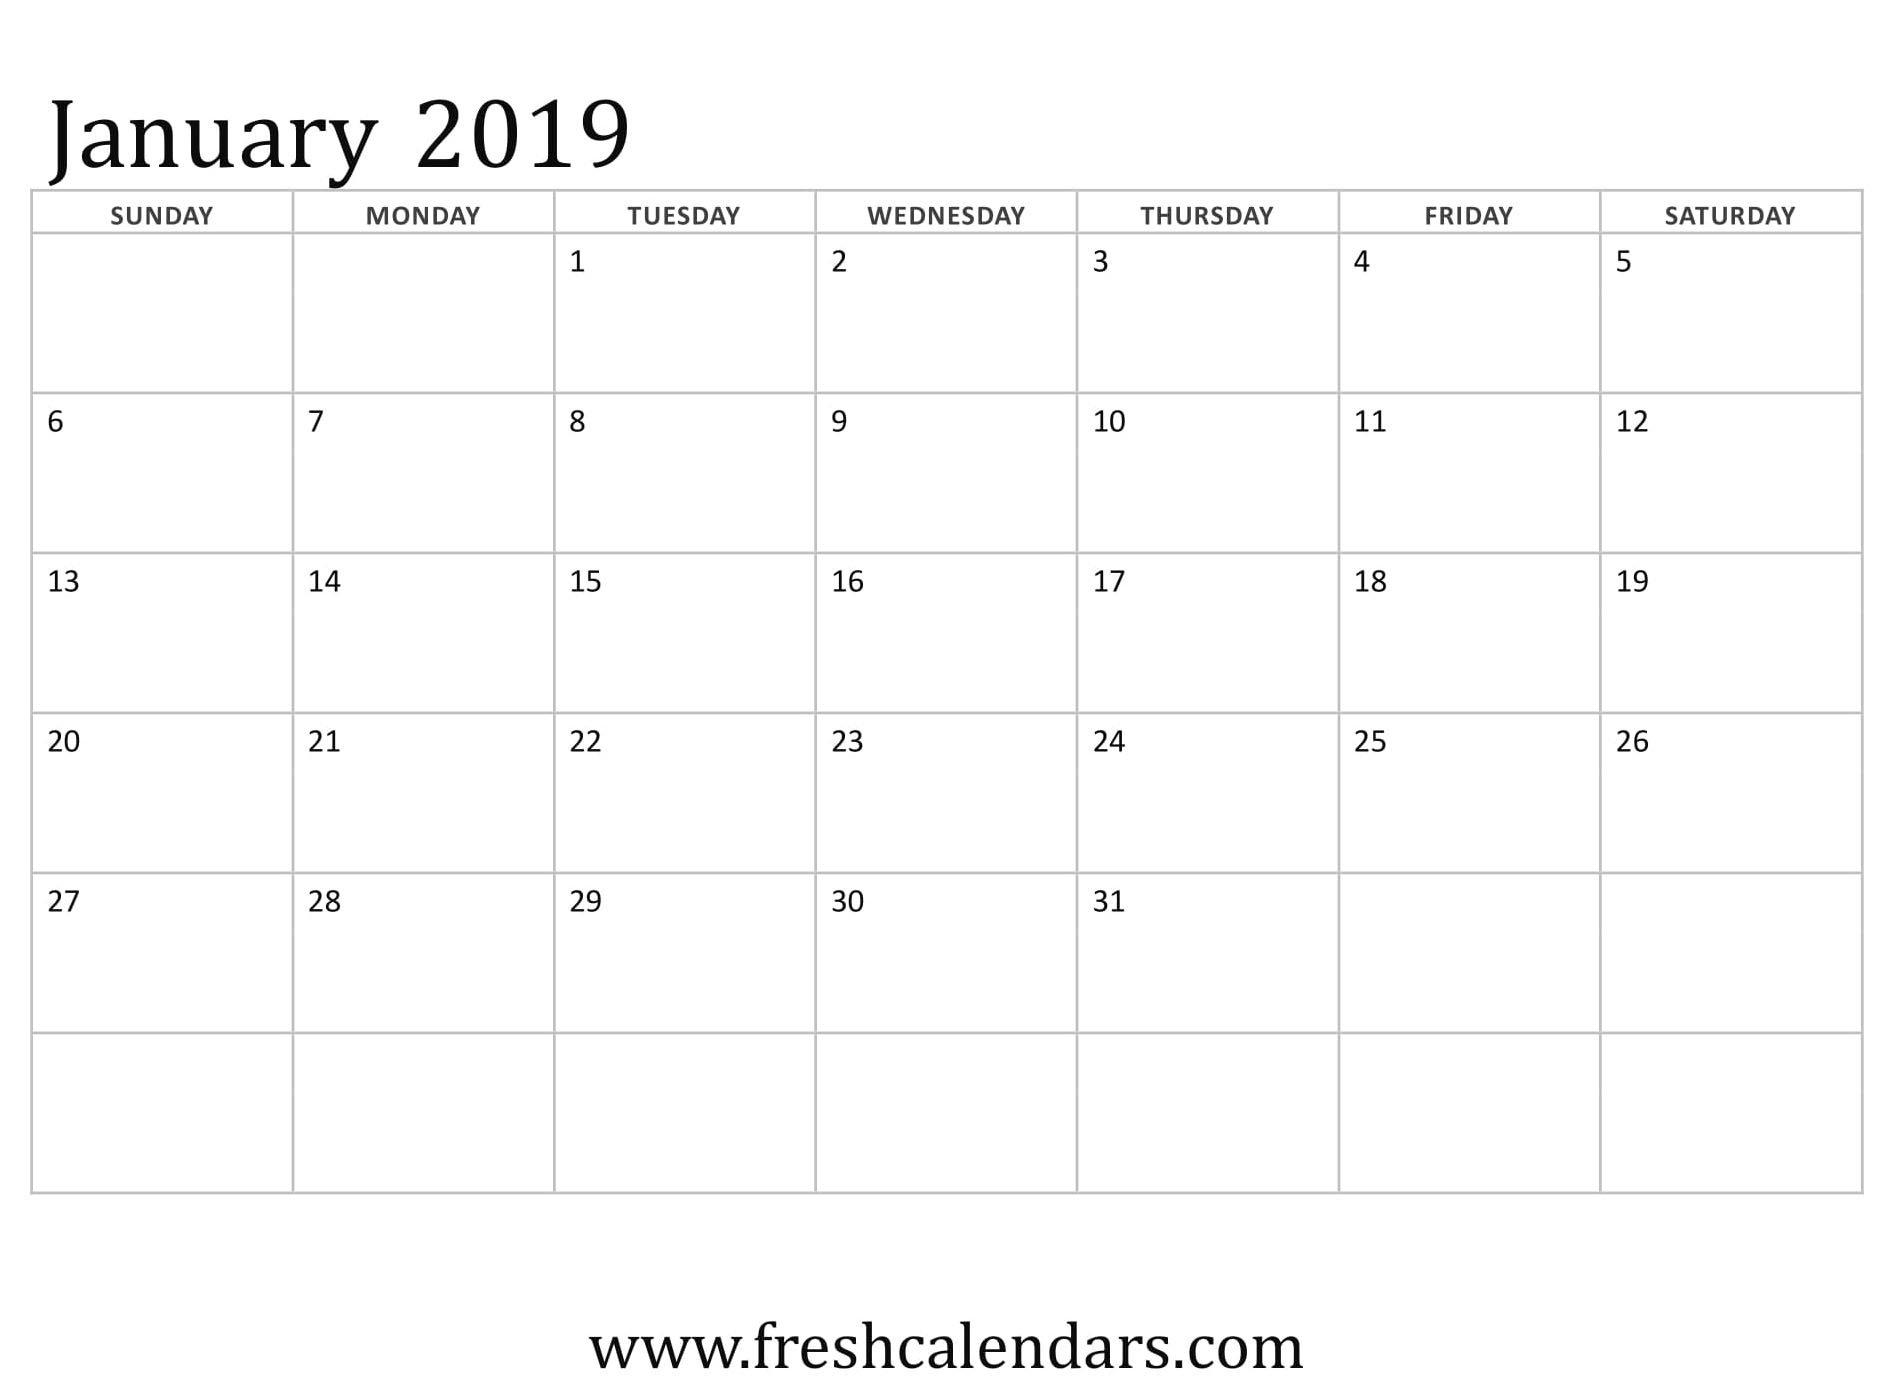 January 2019 Printable Calendars – Fresh Calendars Calendar 1/2019